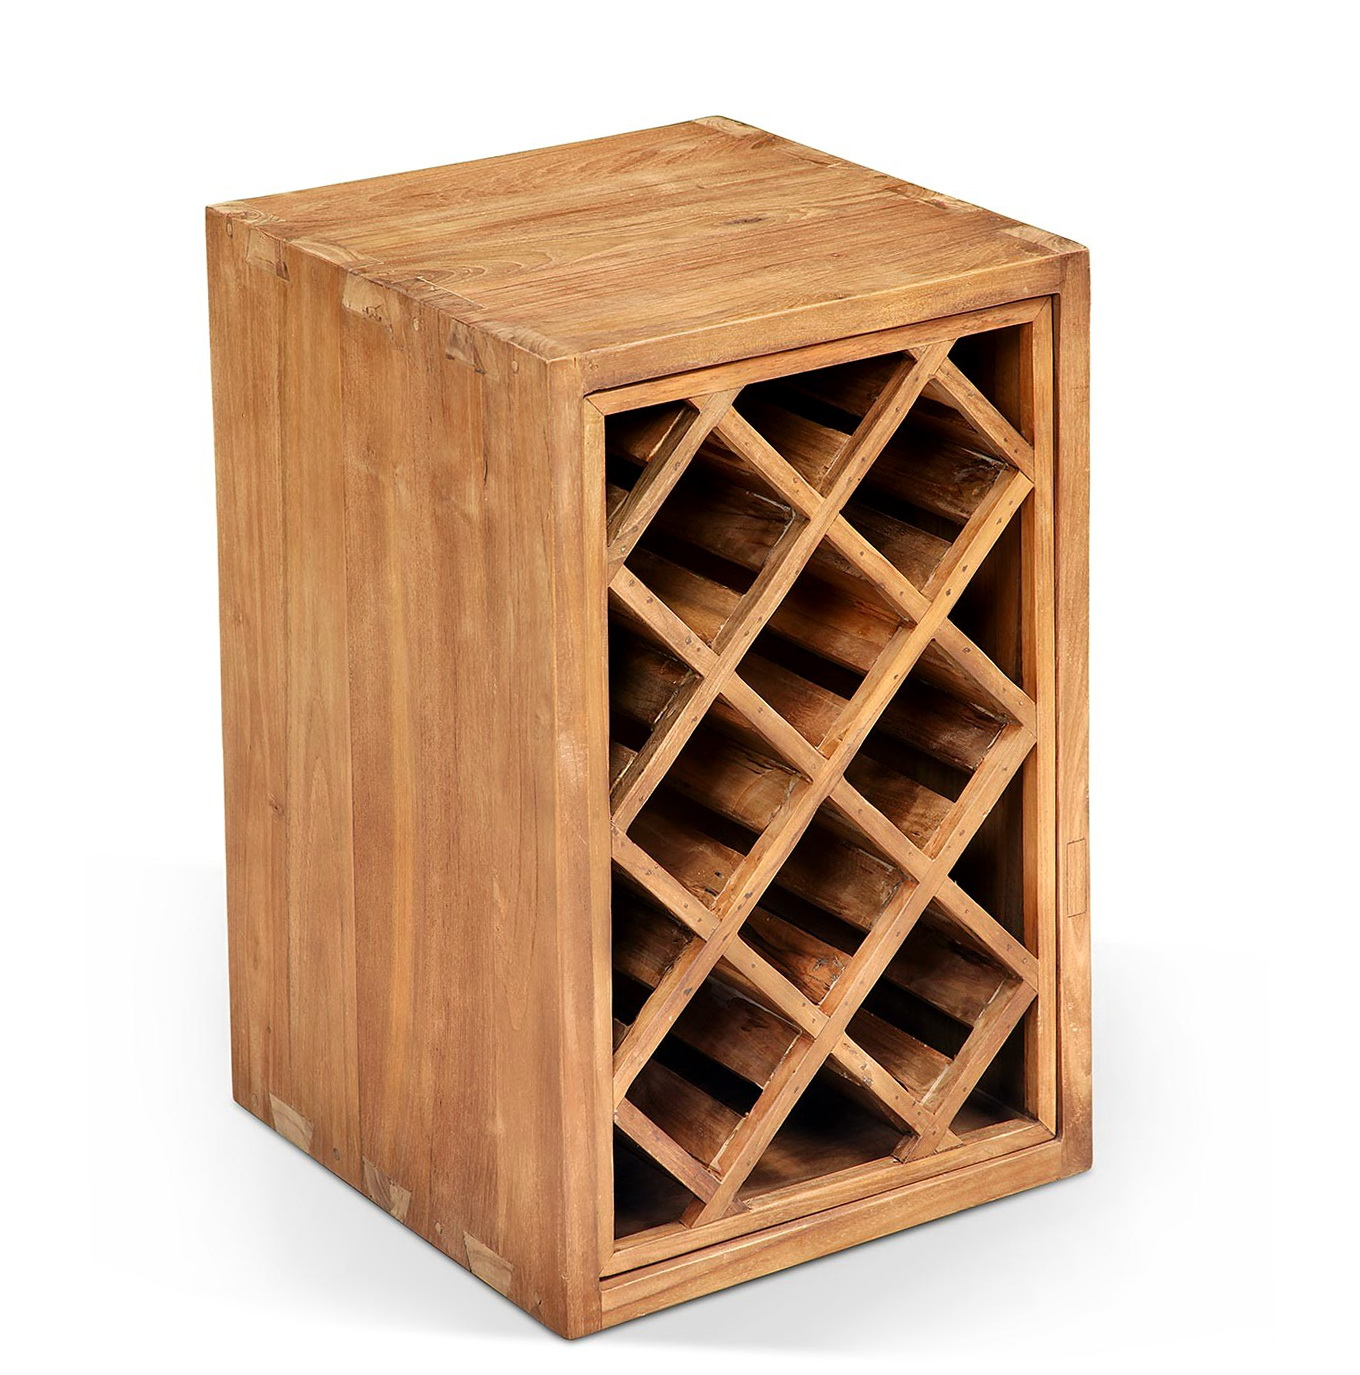 Small Wooden Wine Racks ~ Small wine racks uk home design ideas